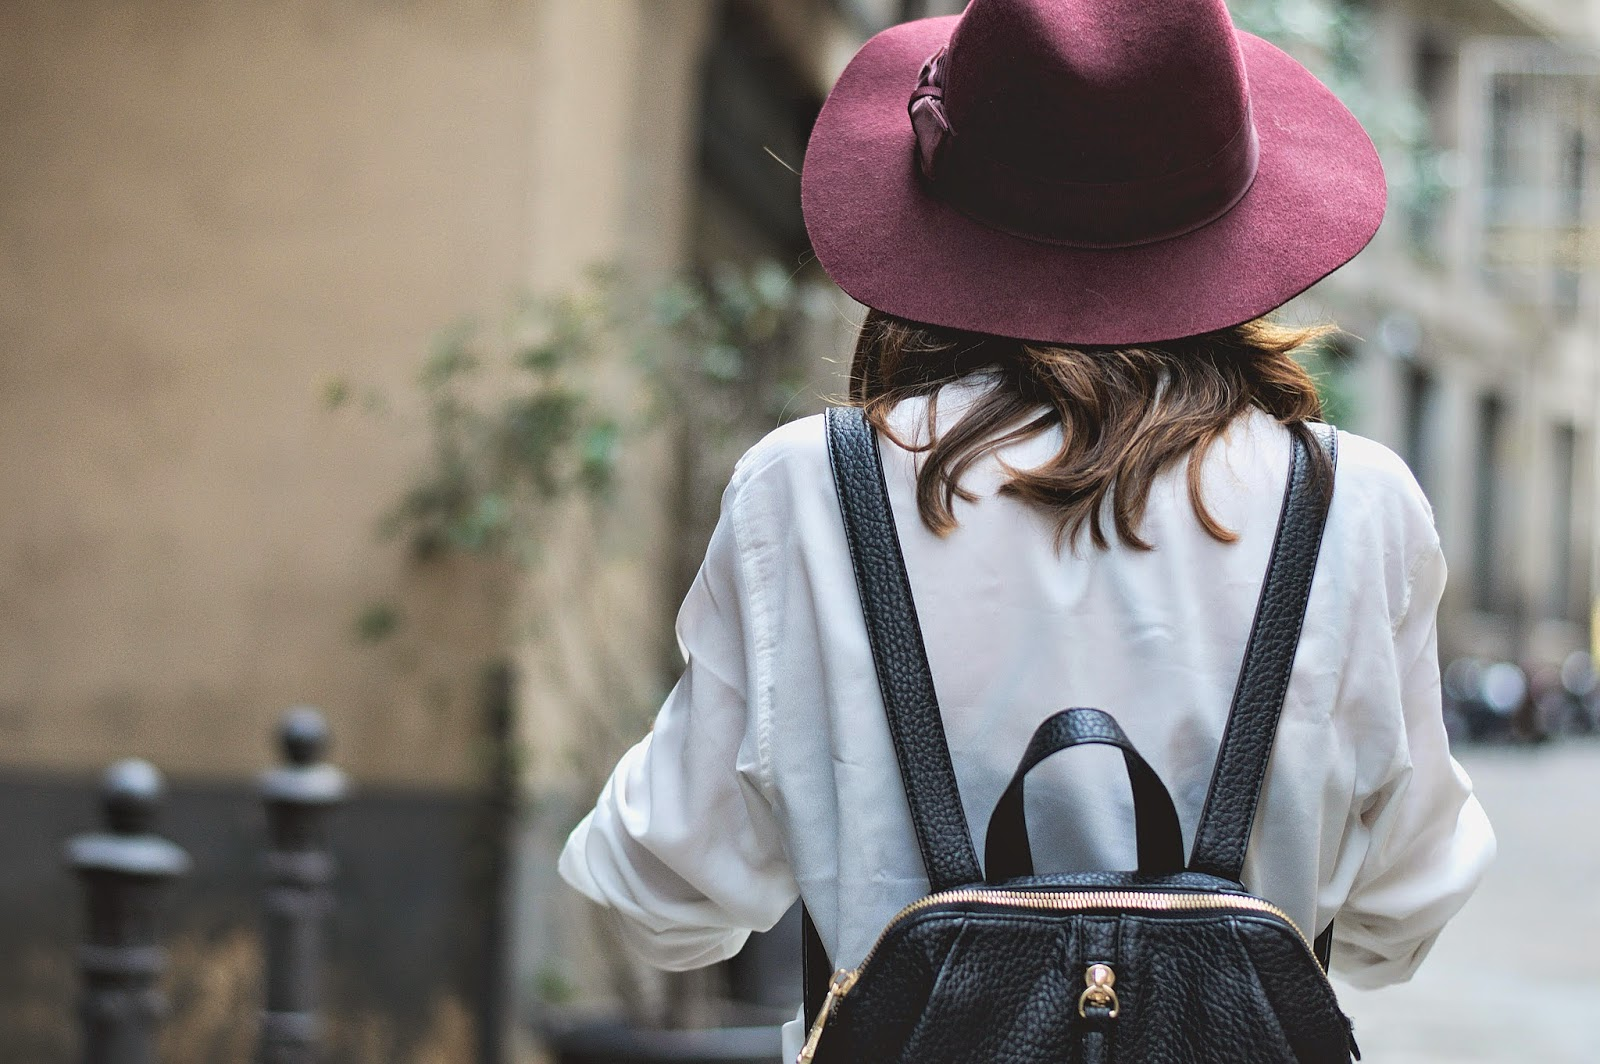 Mono fashion pills, camisa Mango, bolso Pepe Moll, sombrero burgundy H&M, stilettos piel negra Menbur